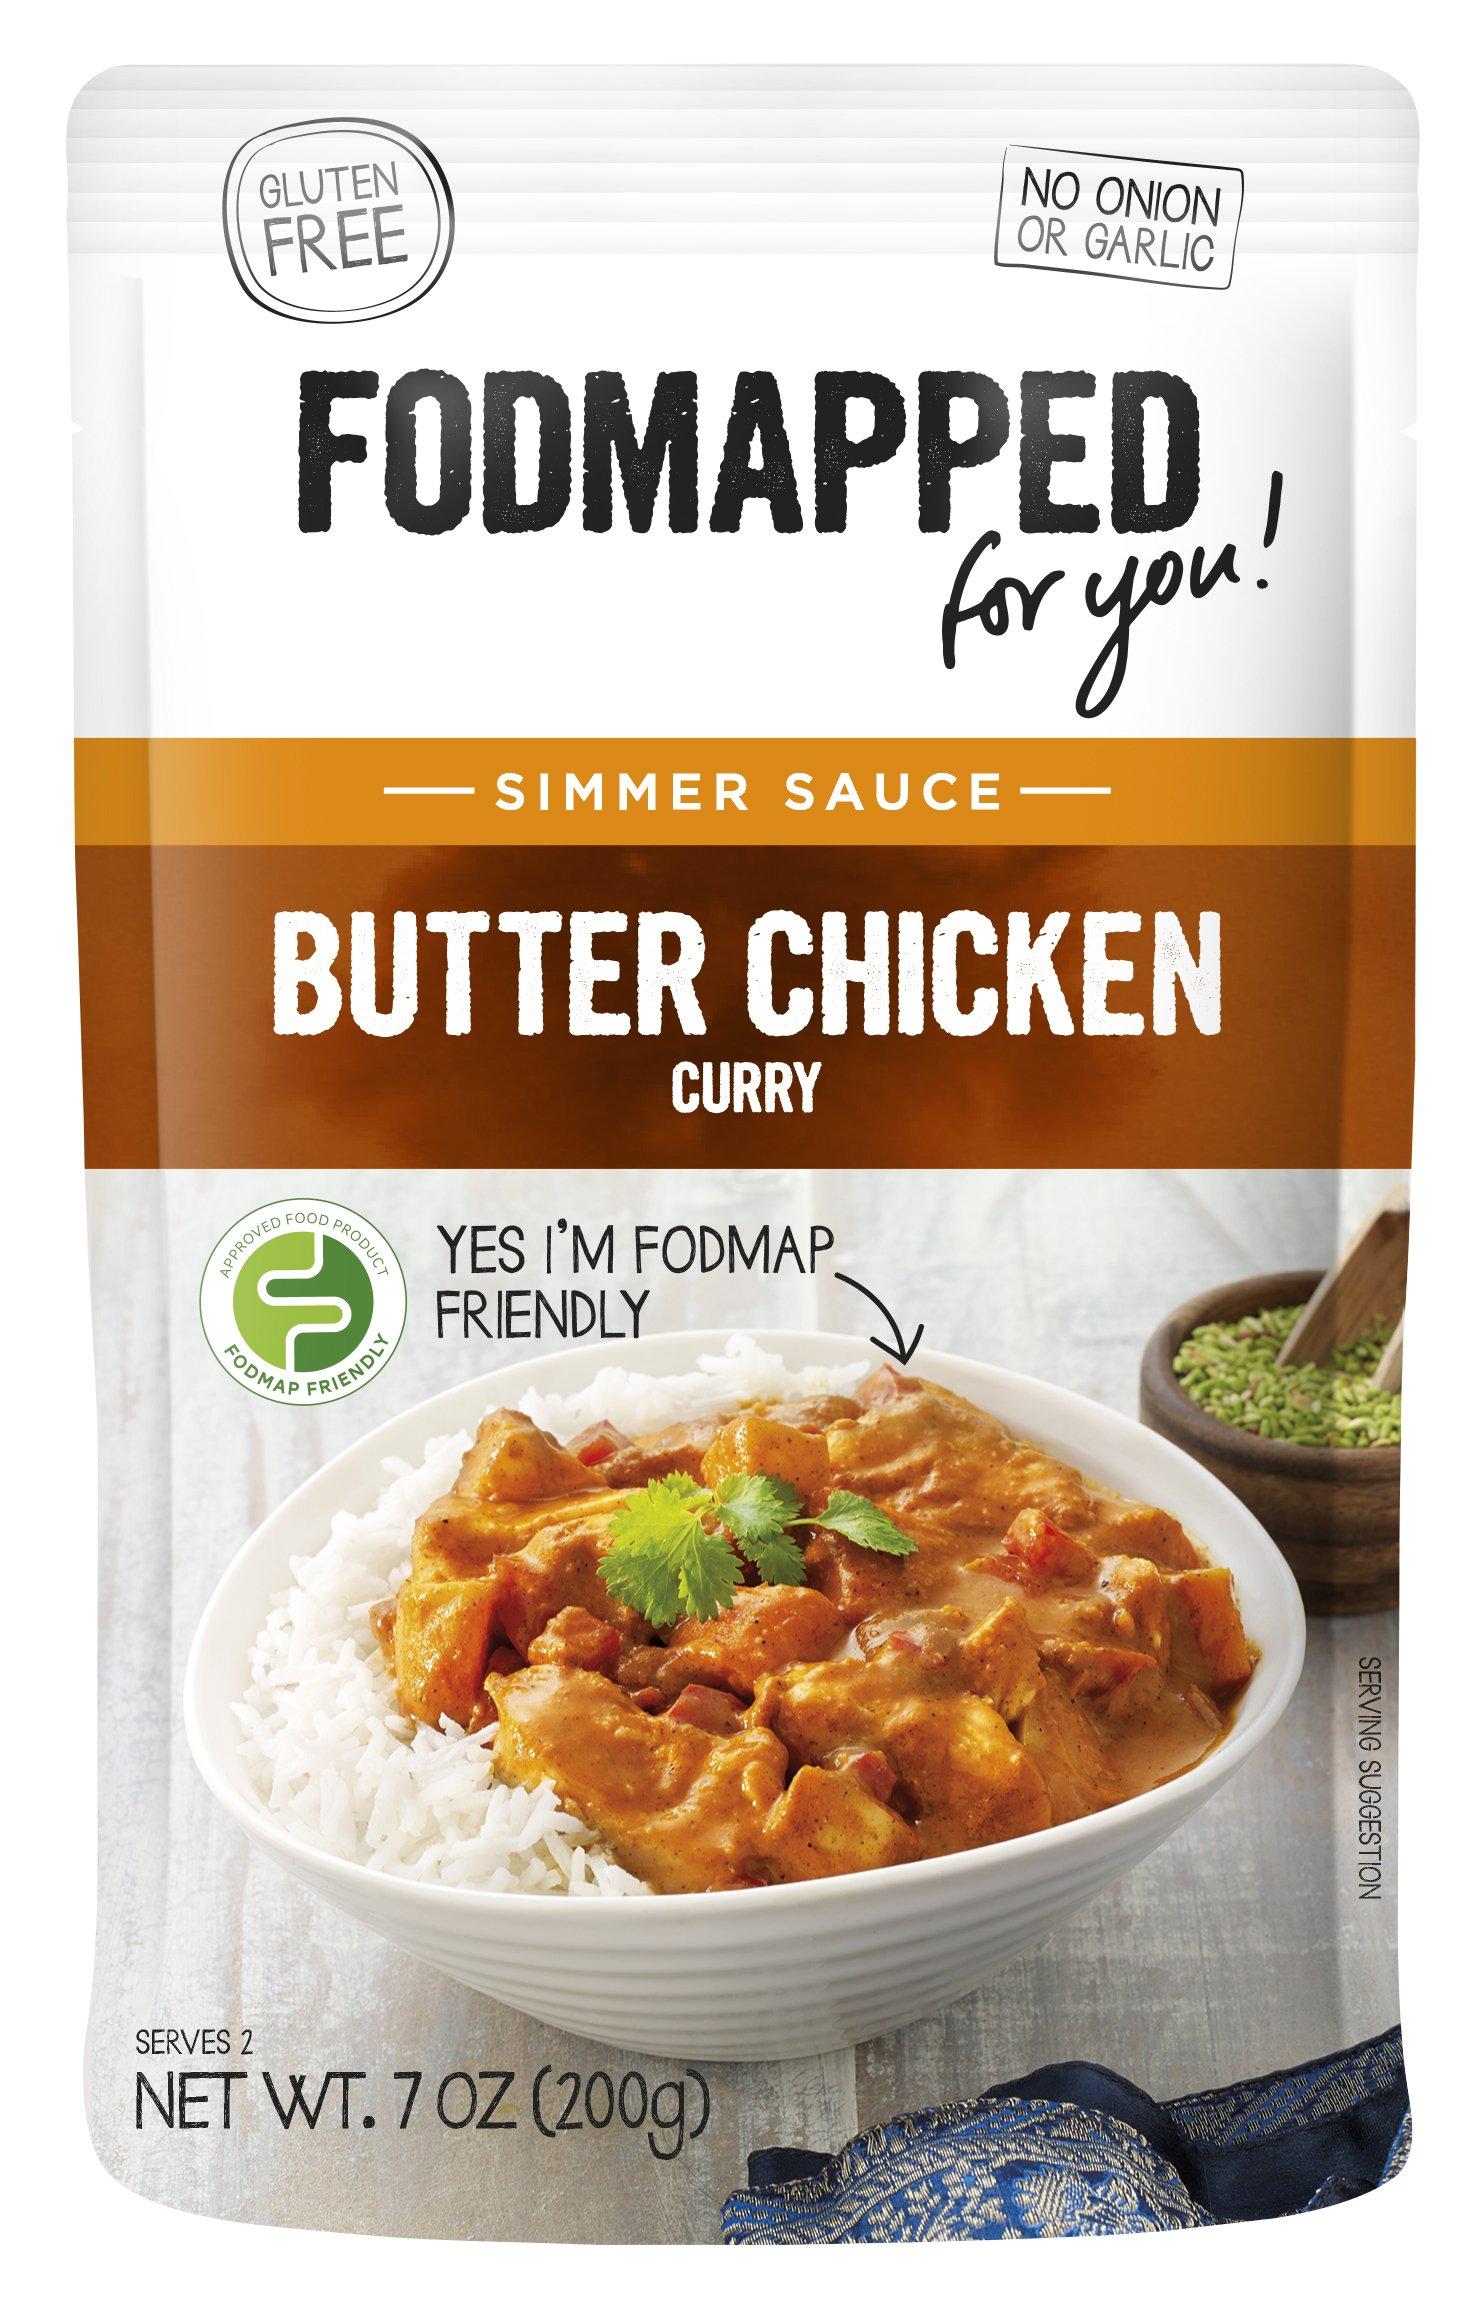 Fodmapped for you! FODMAPPED - Low FODMAP Butter Chicken Simmer Sauce 7 OZ (200g)